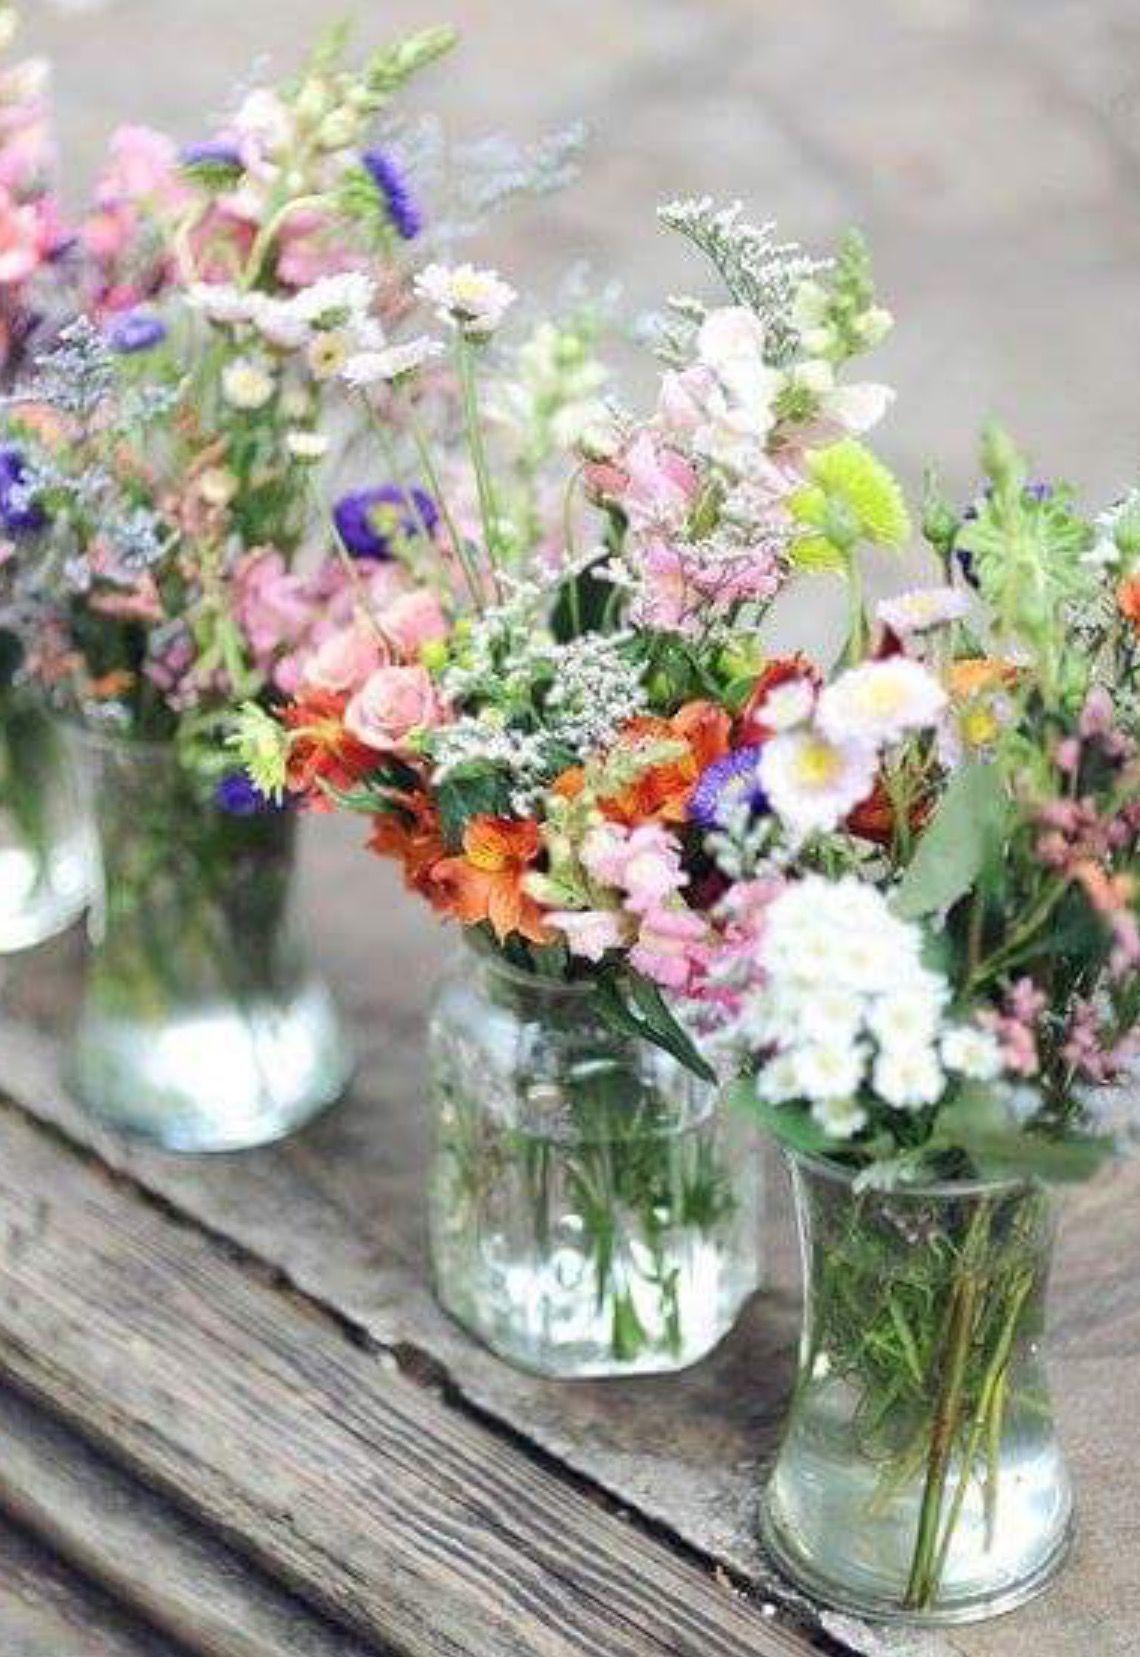 Pin By Pam Guite On Gardening Wedding Flowers Wedding Wedding